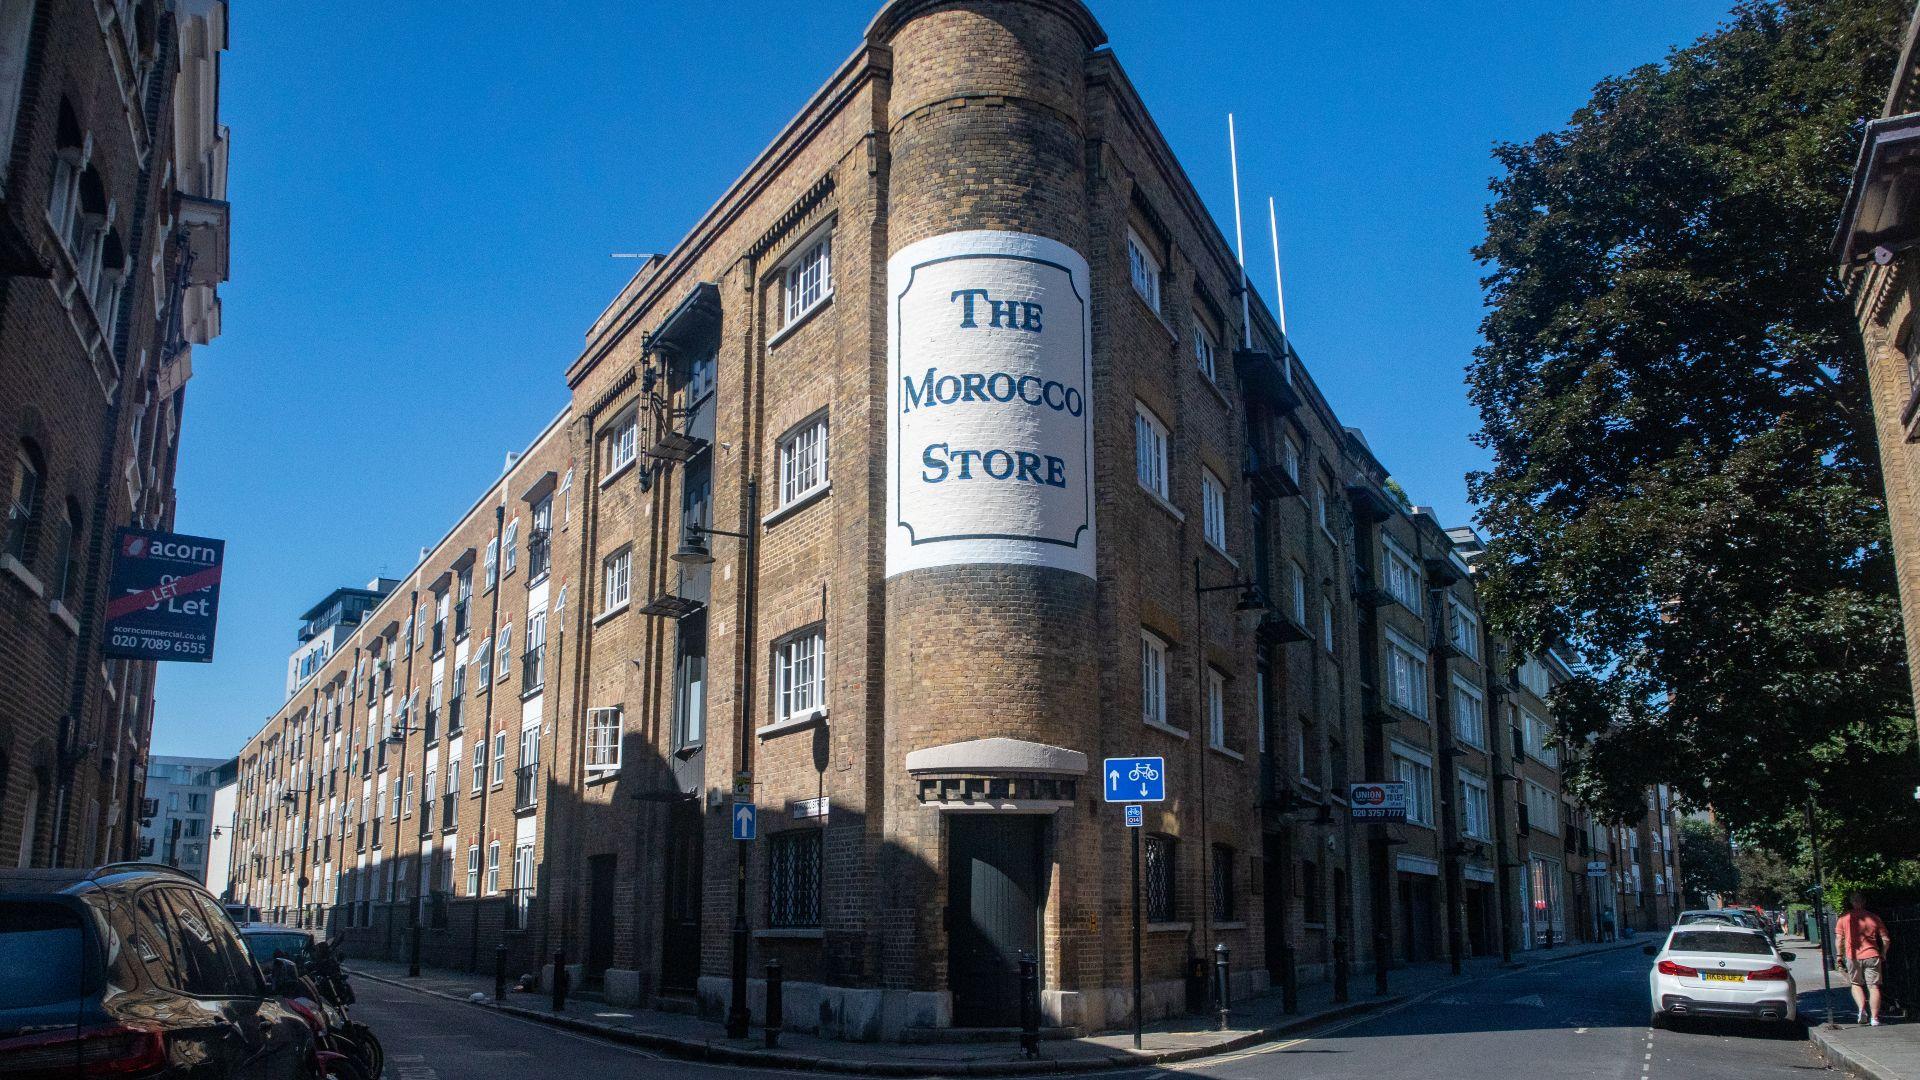 London's Bermondsey (QUEST IN TEST MODE) image